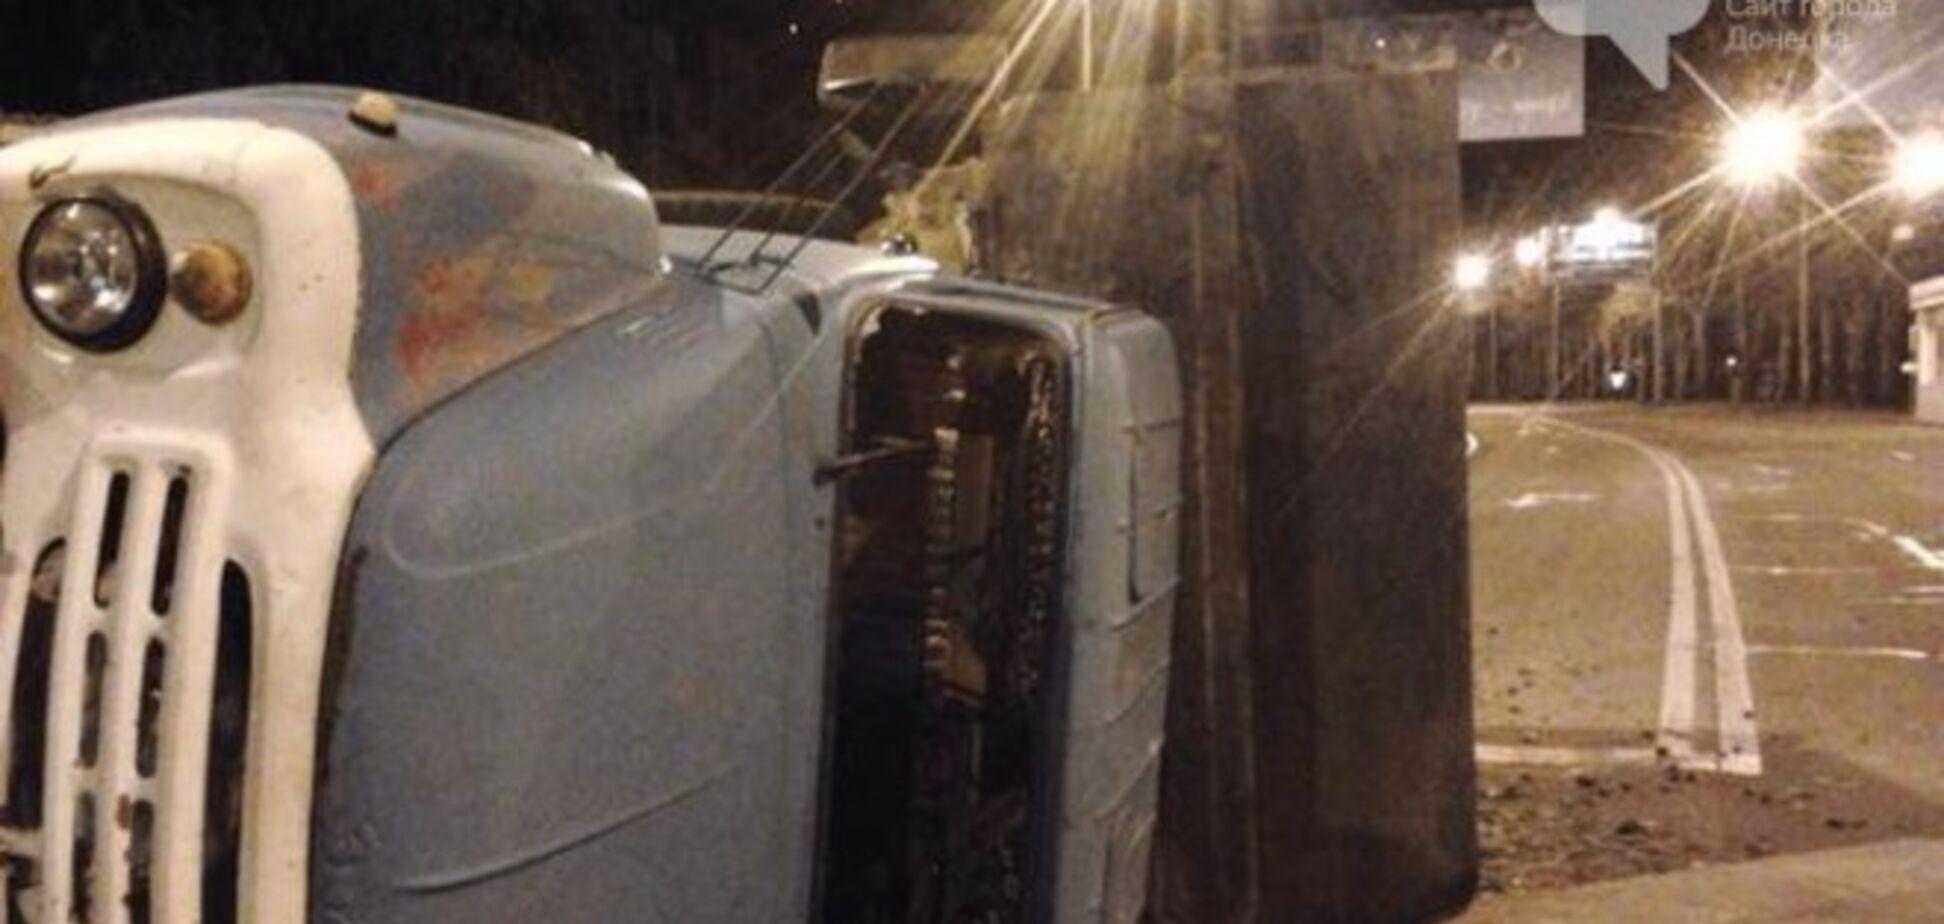 В центре Донецка боевики на танке сбили грузовик: опубликованы фото